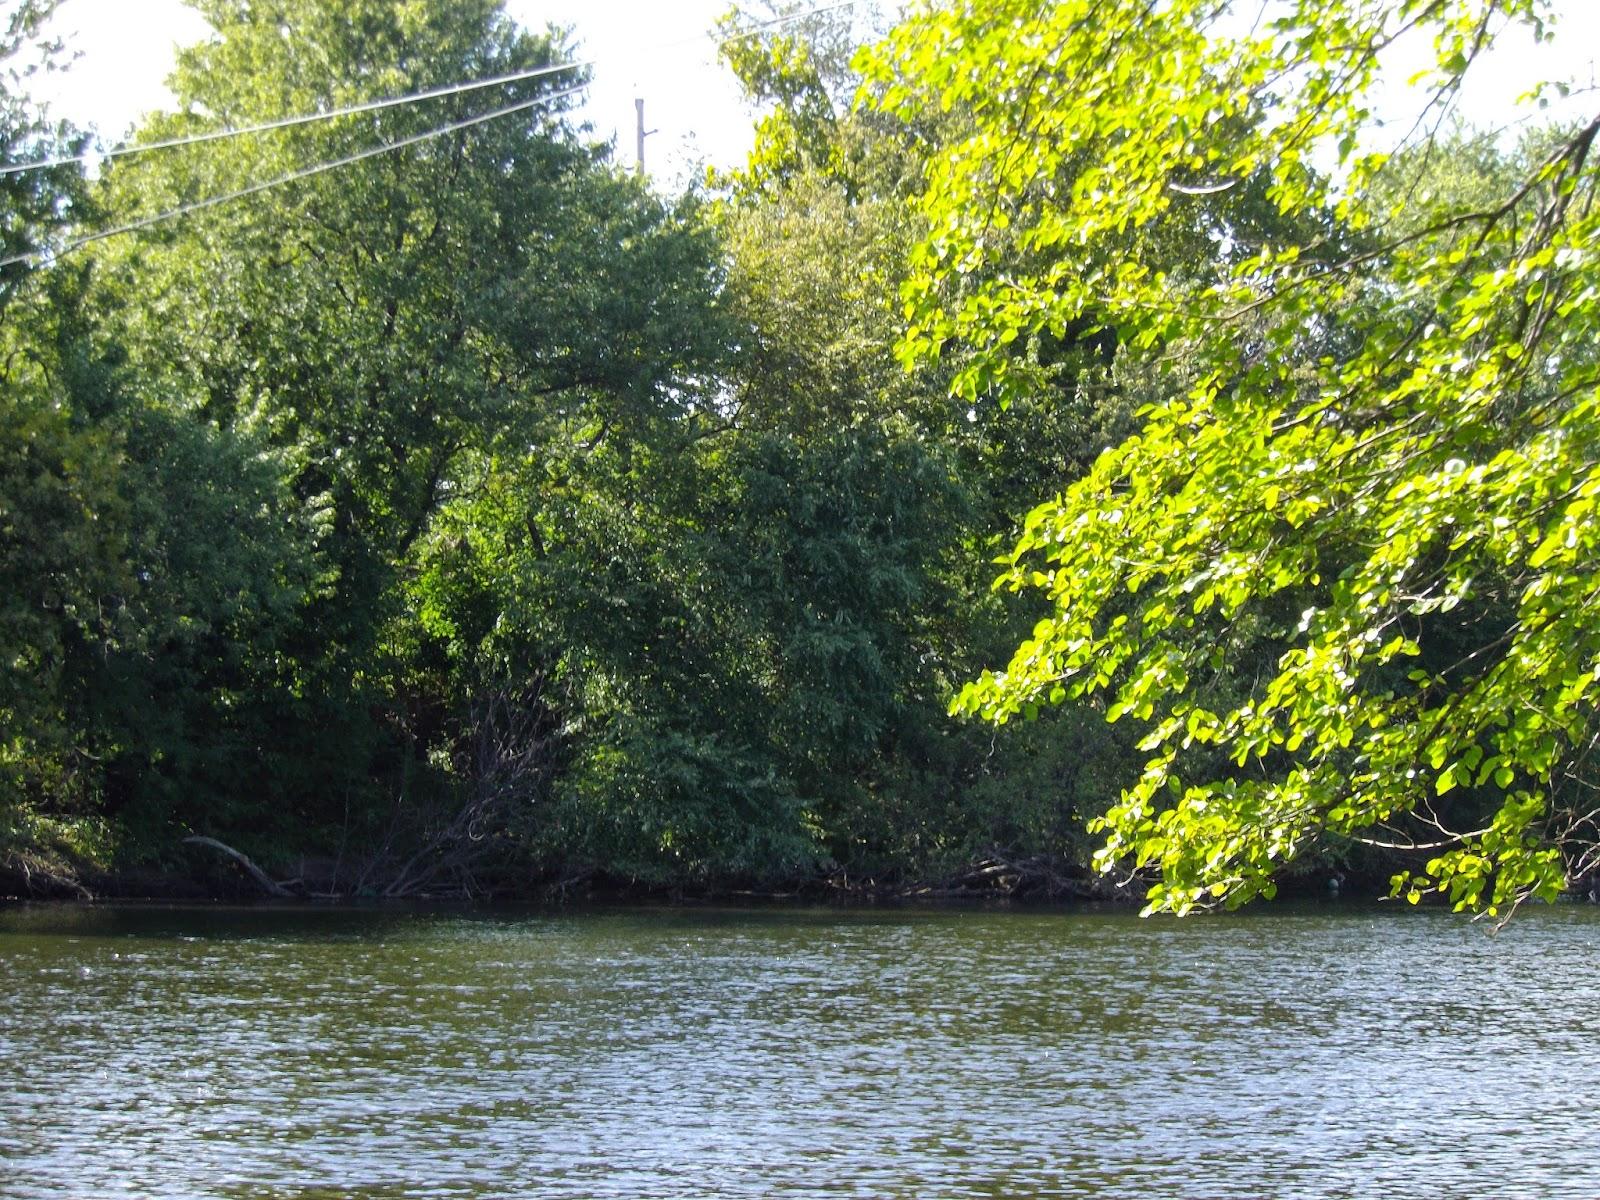 Passaic river at radburn new jersey the great lakes of nyc for Passaic river fishing